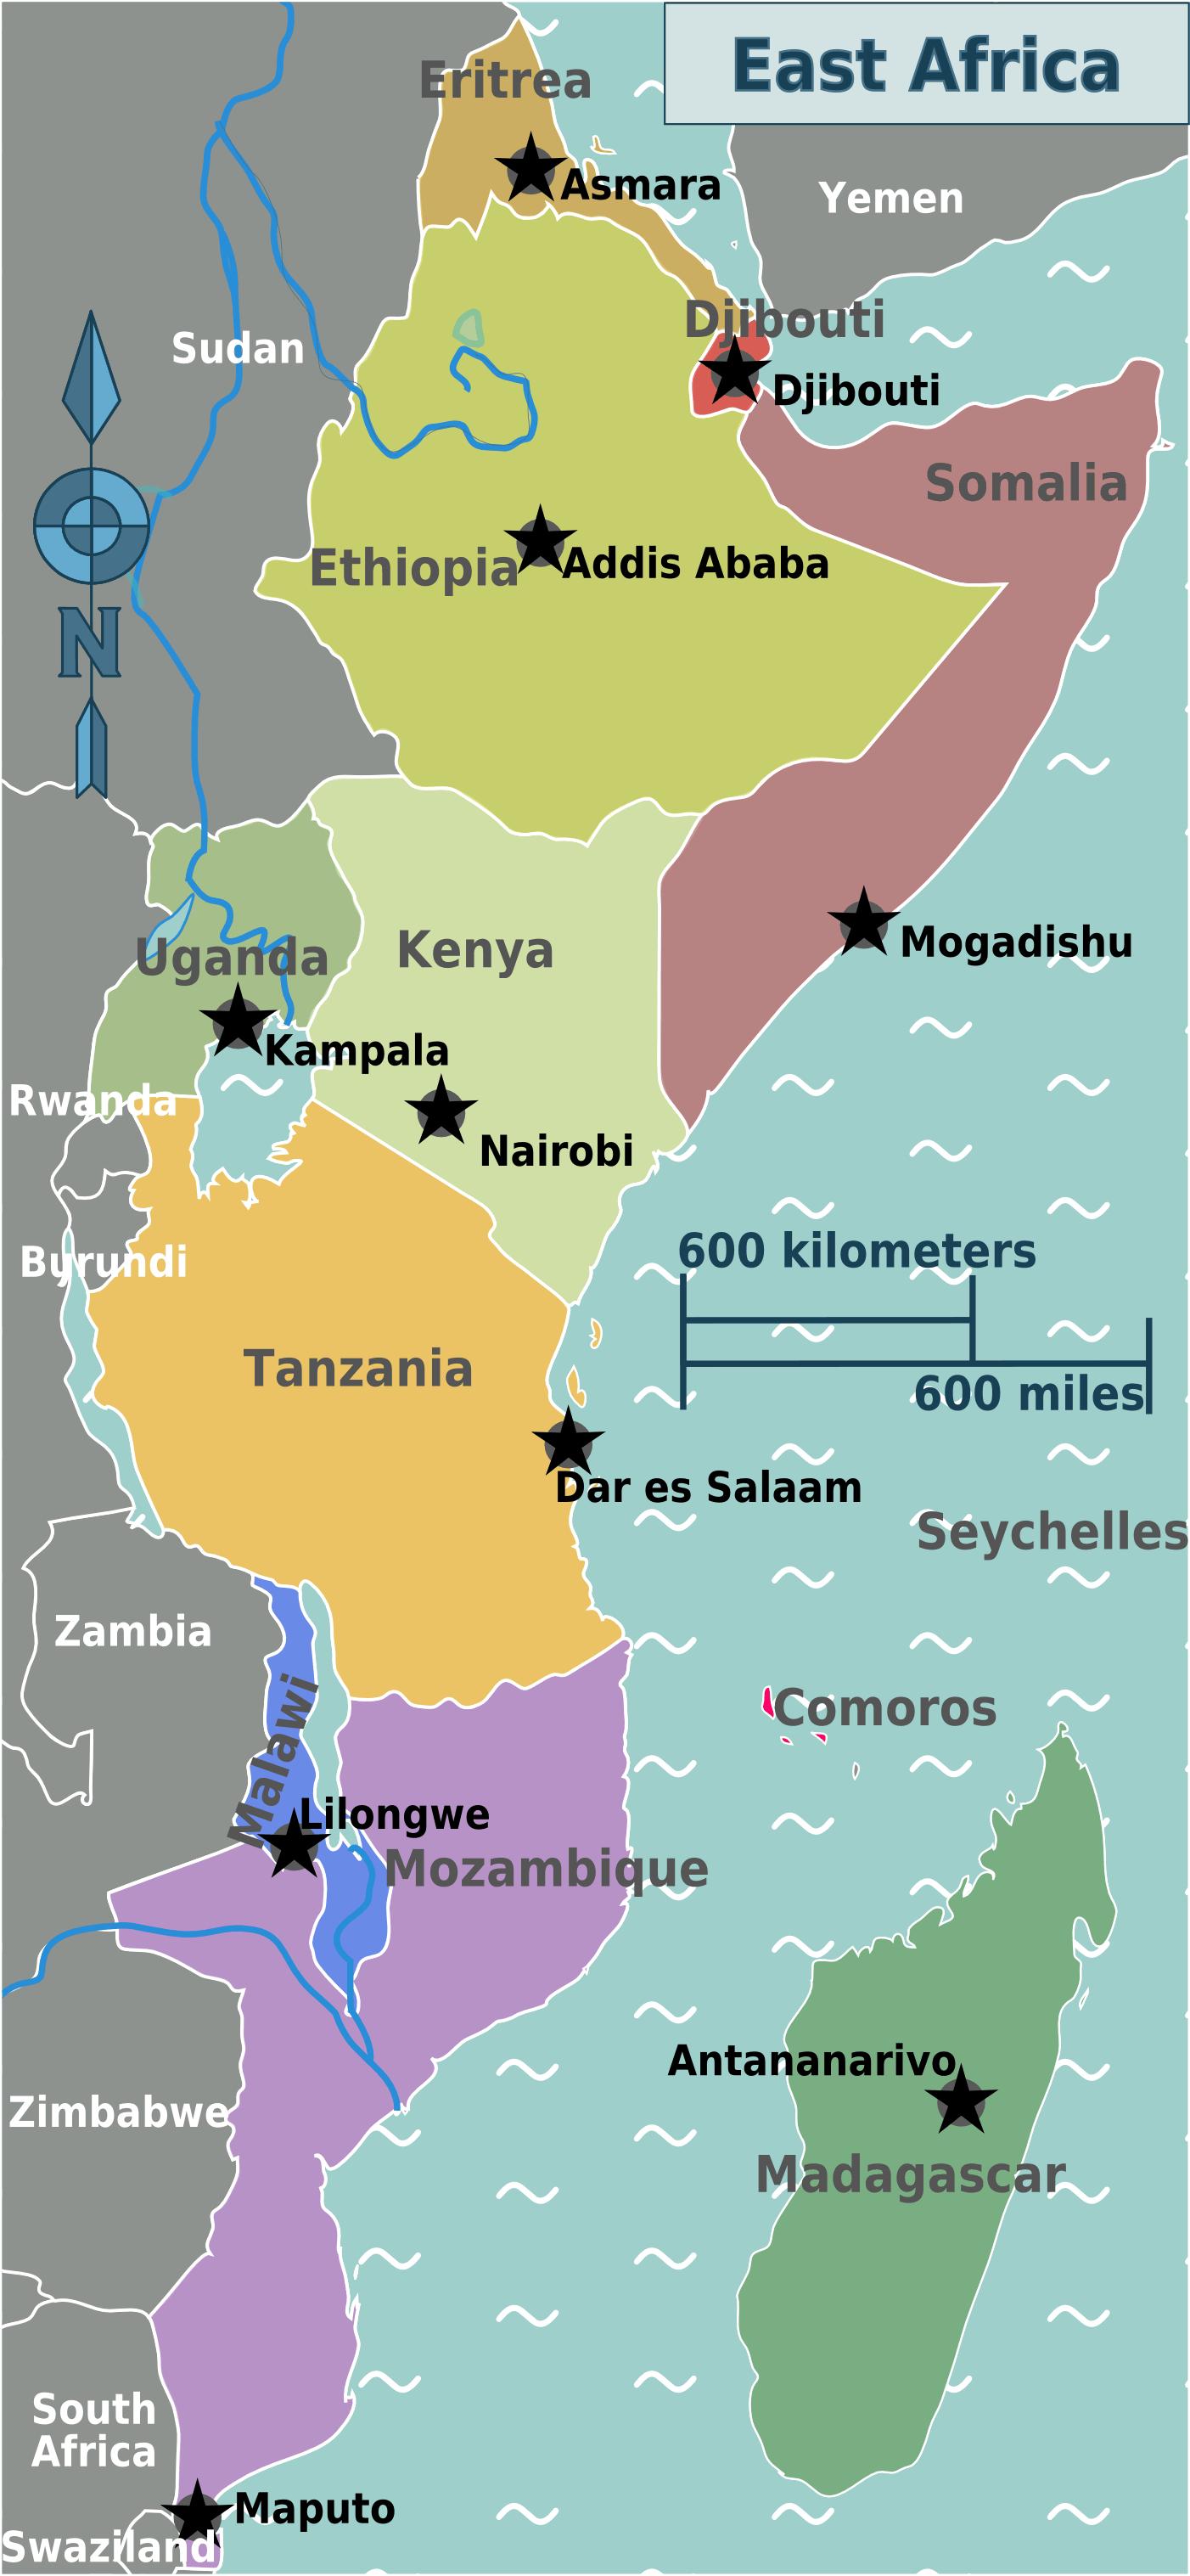 East Africa Regions Map Mapsofnet Africa Pinterest East - Regions of africa